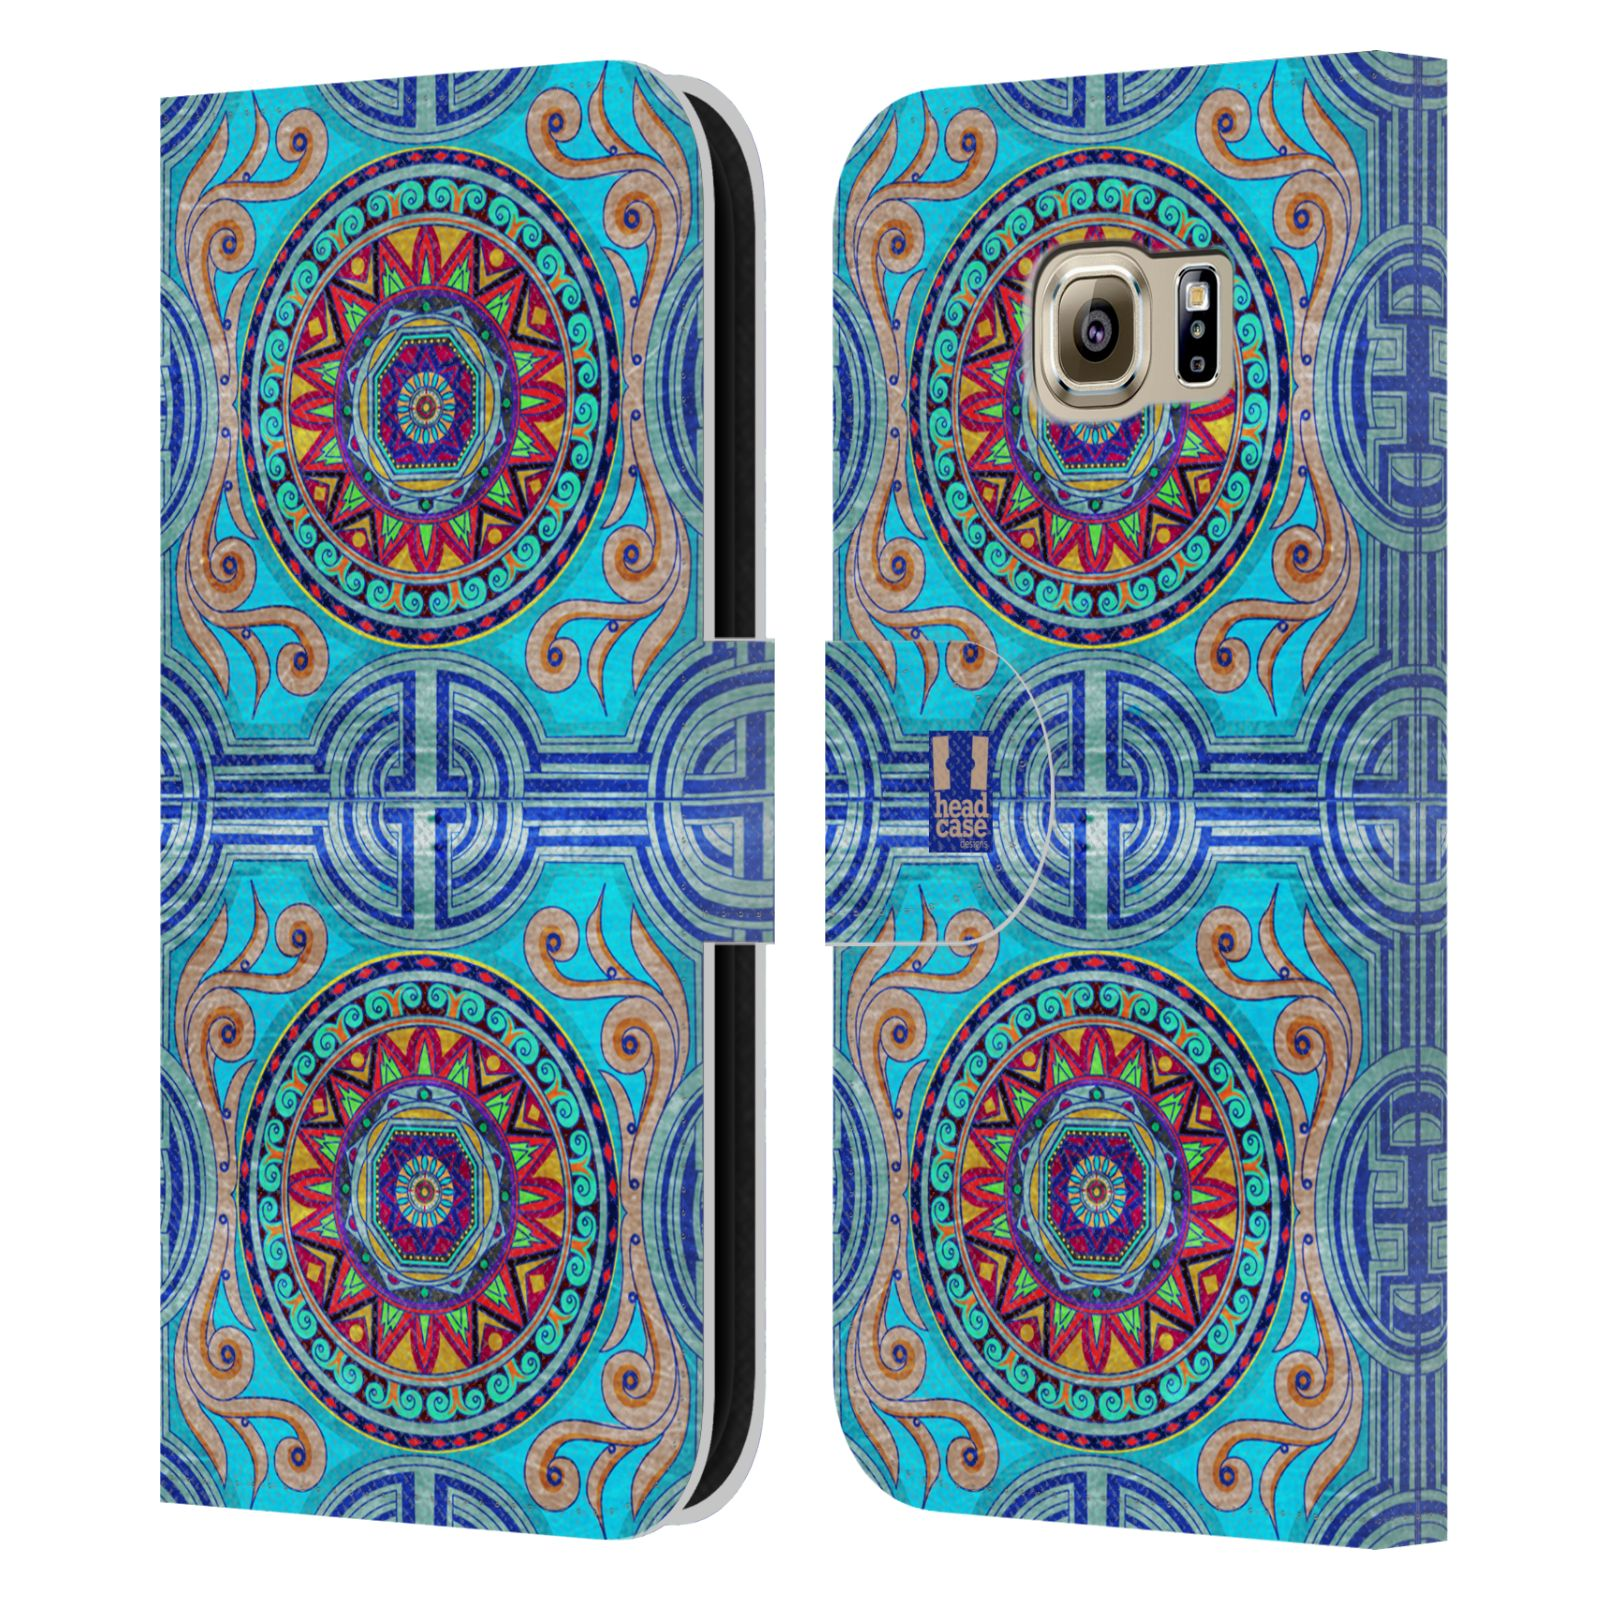 HEAD CASE Flipové pouzdro pro mobil Samsung Galaxy S6 (G9200) ARABESKA modrá